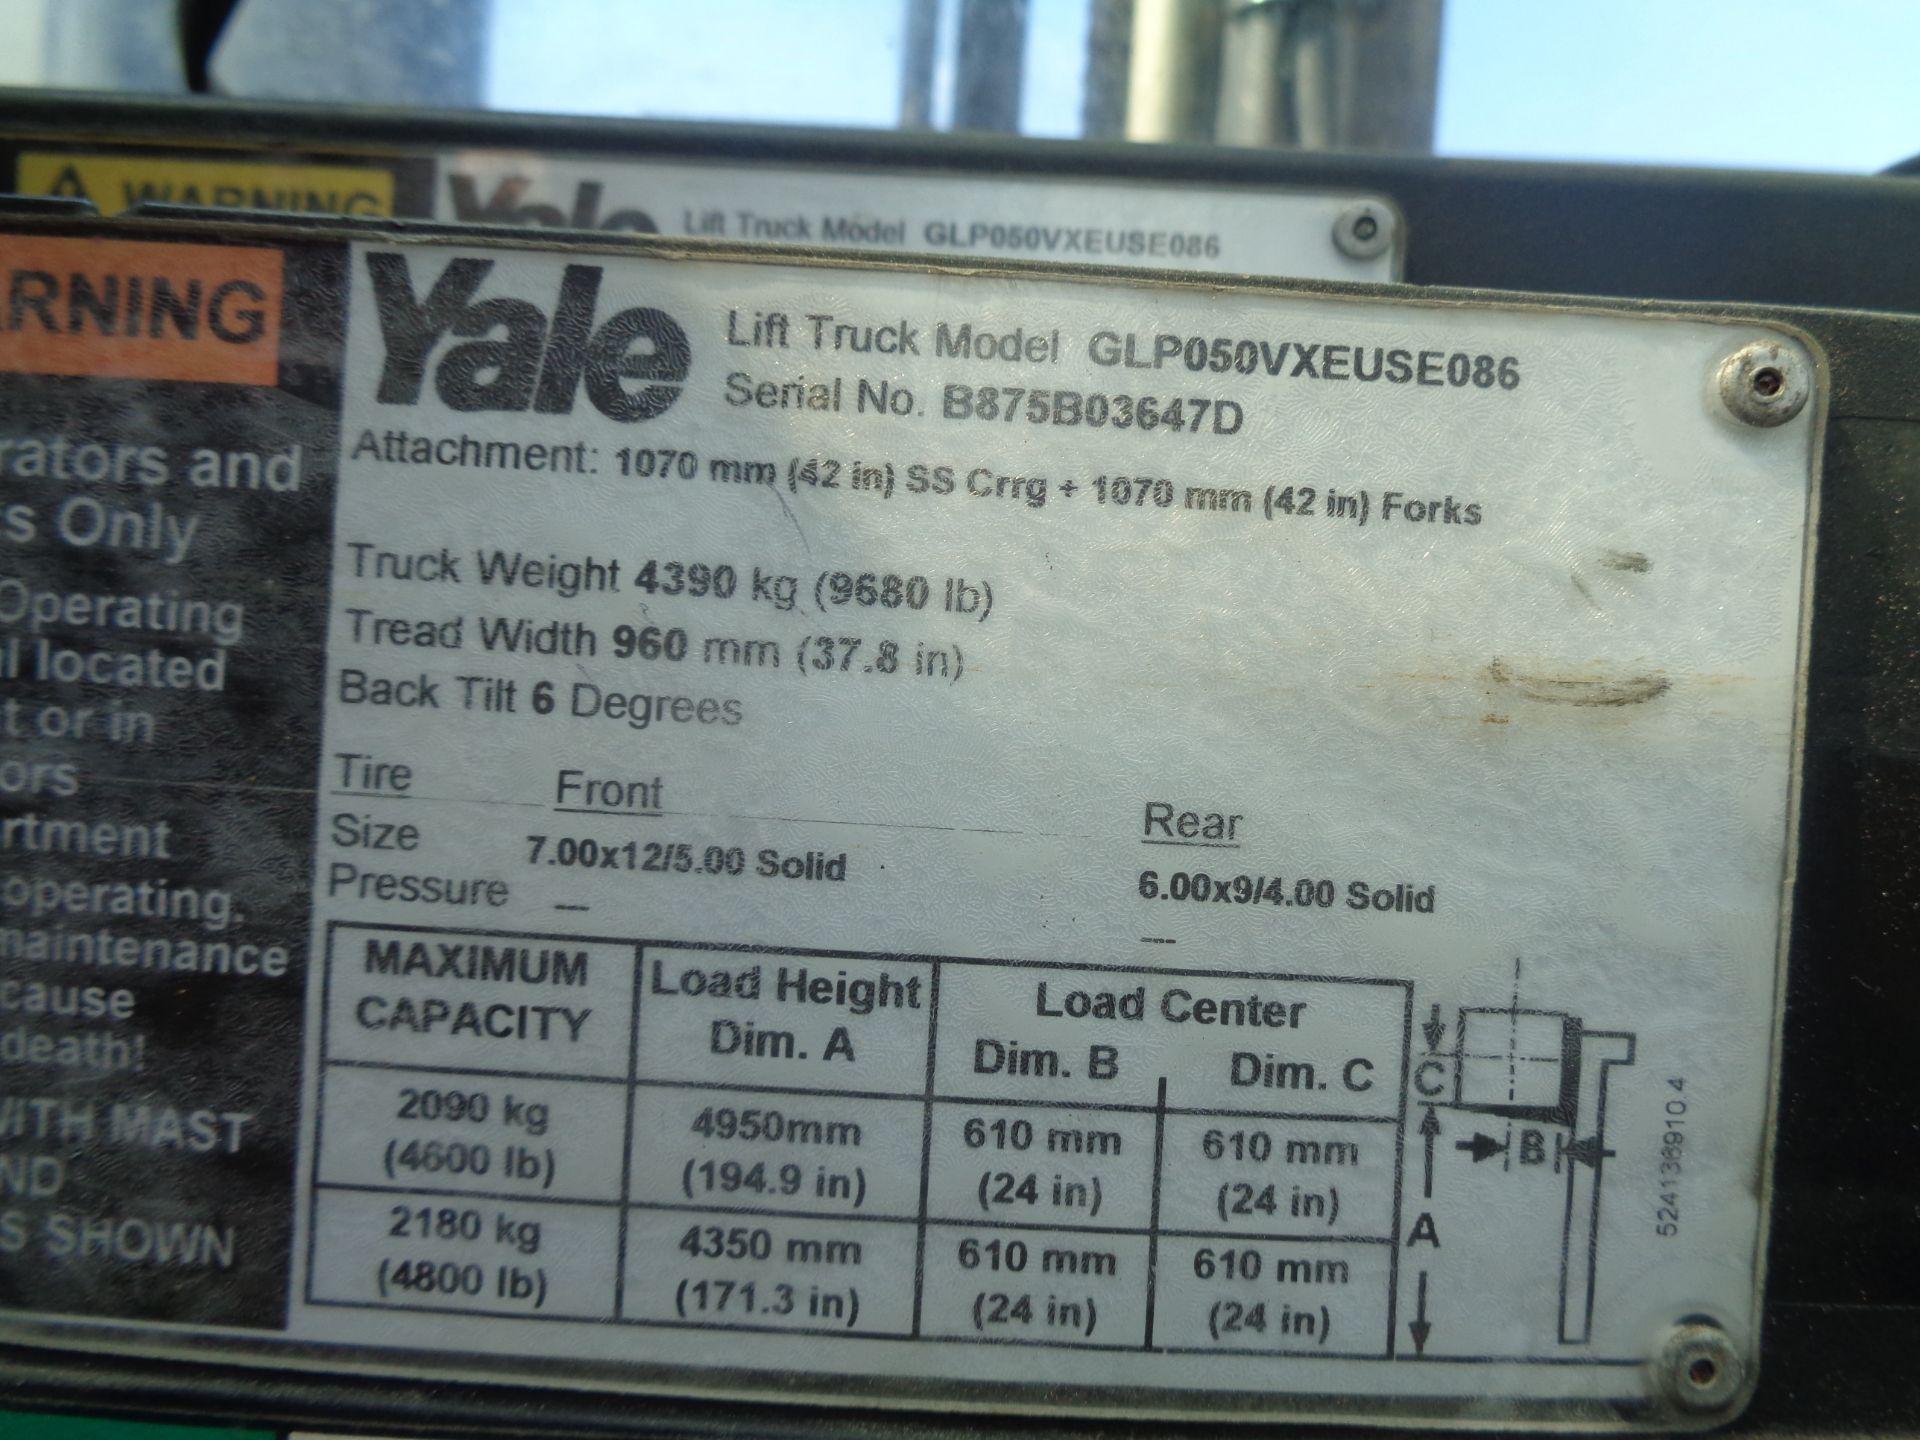 Yale GLP05VXEUSE086 5000 lb Forklift - Image 14 of 14